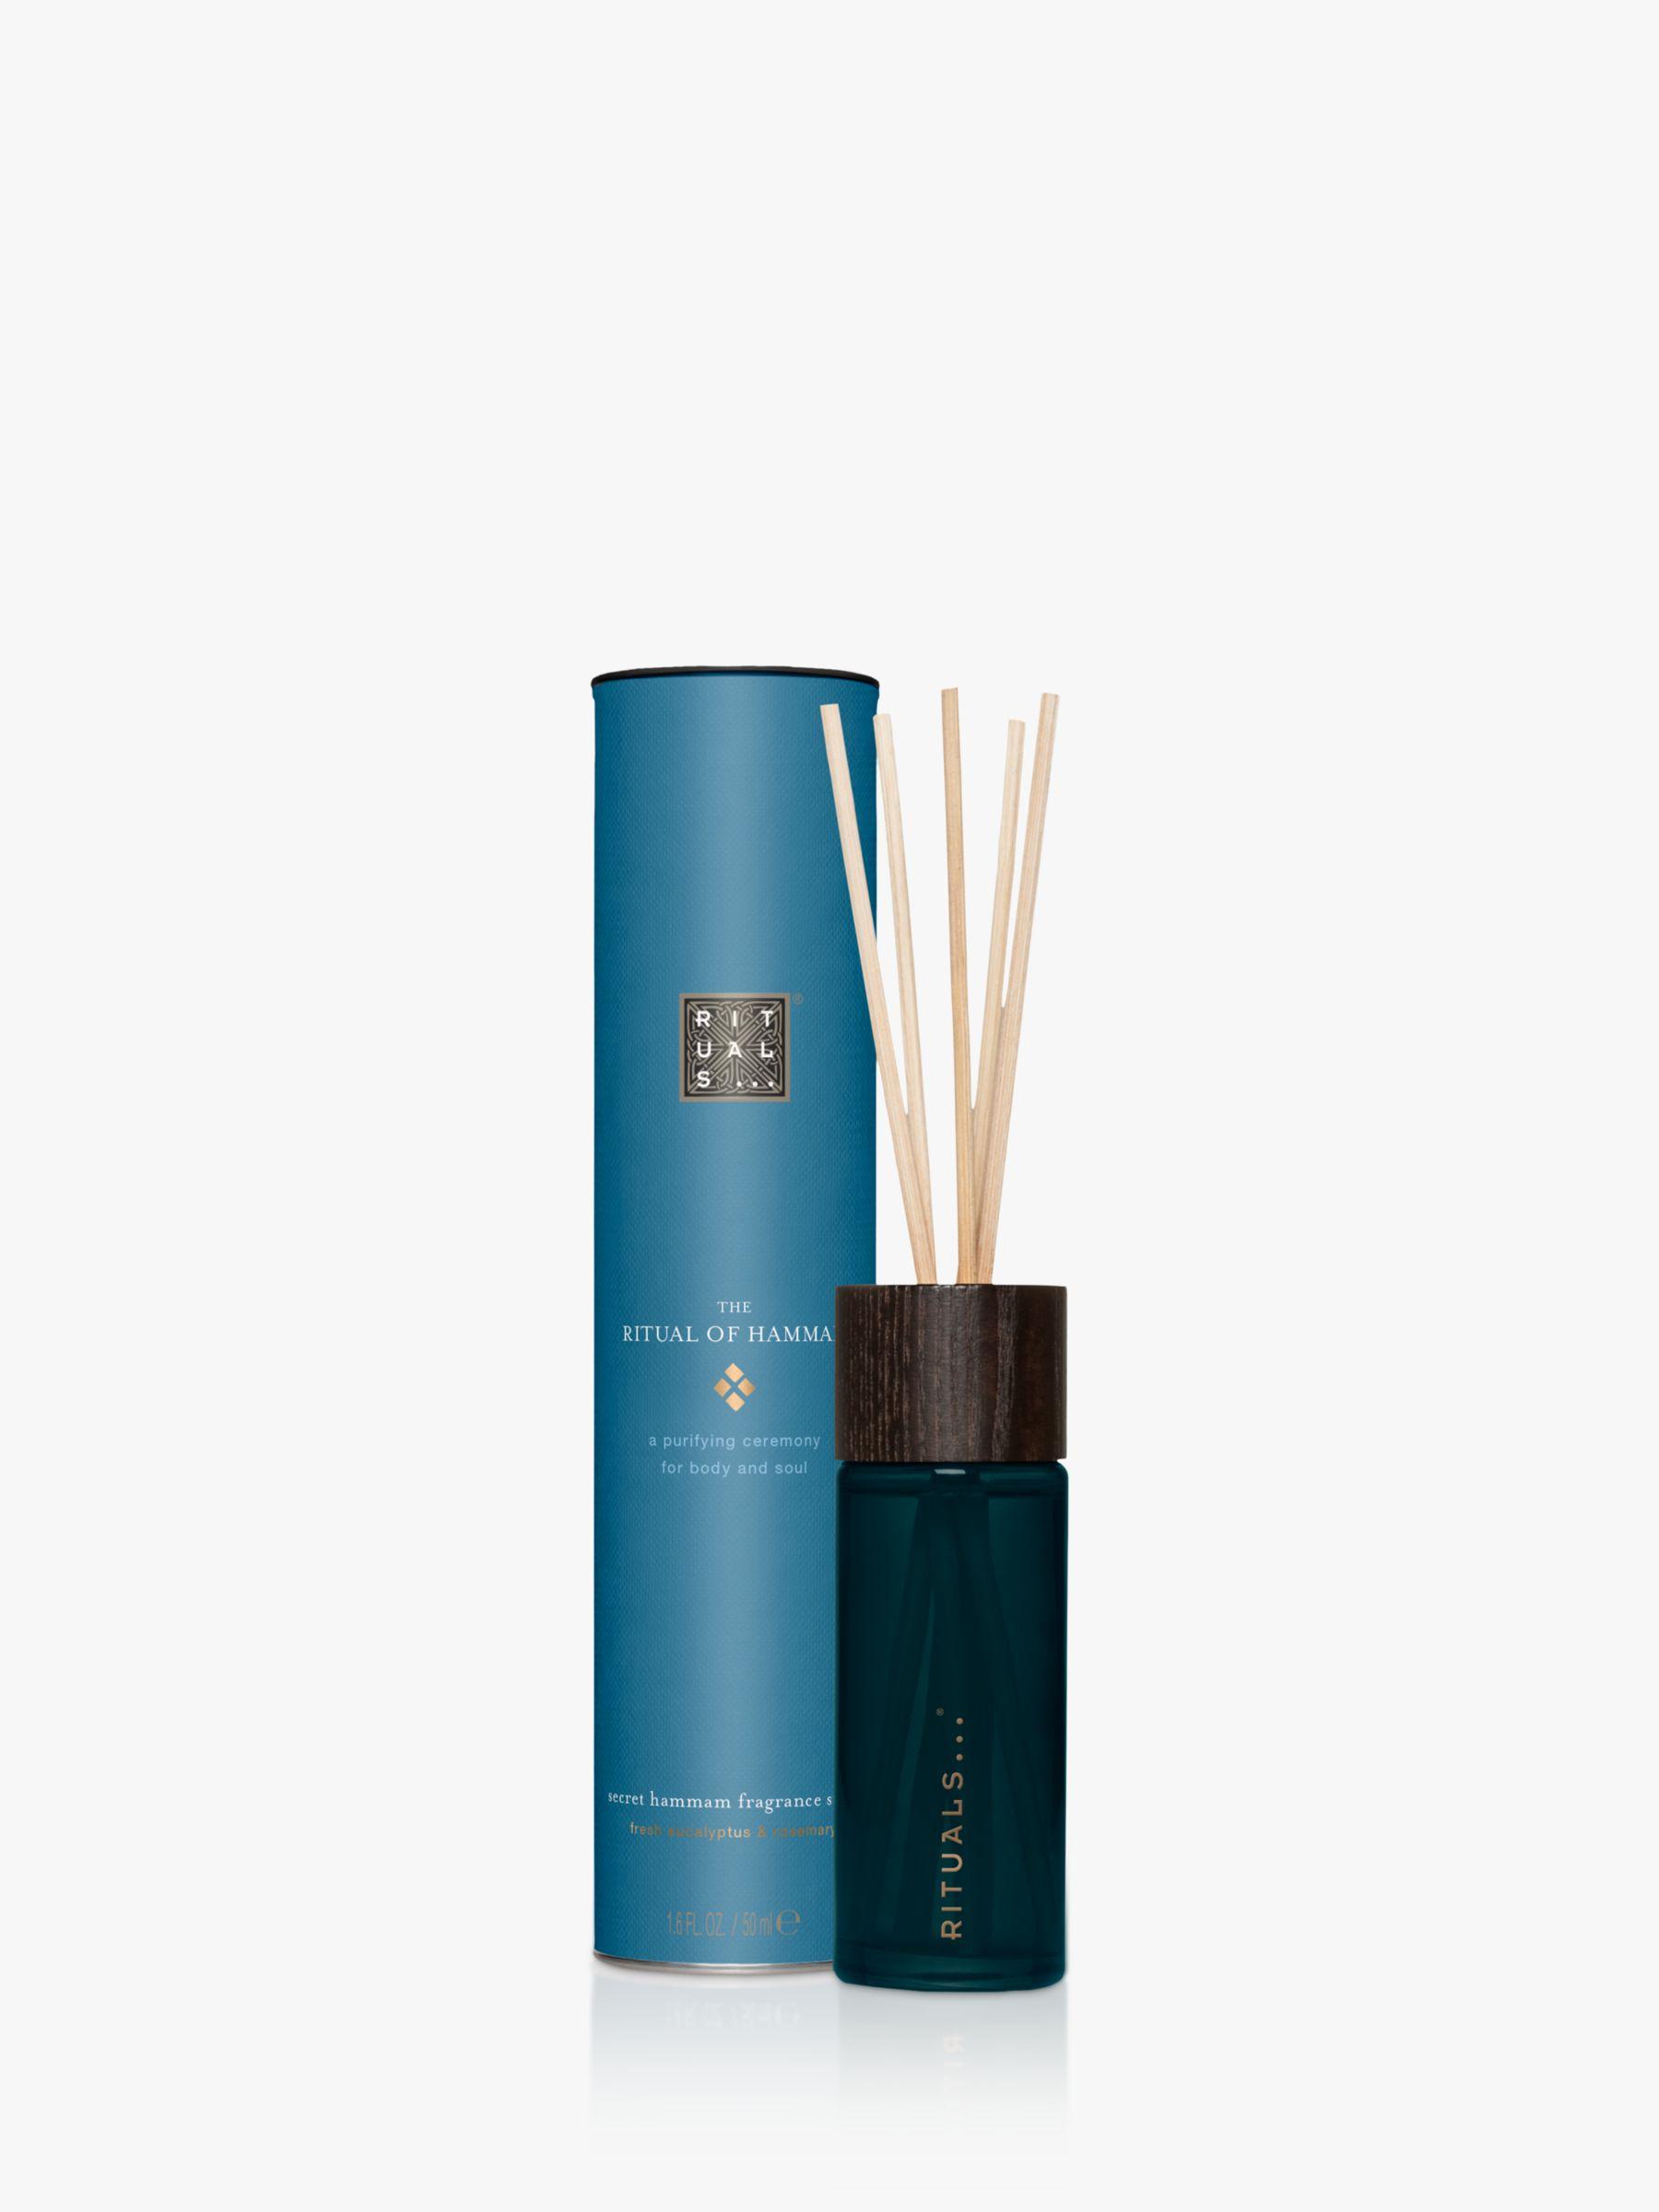 Rituals Rituals The Ritual of Hammam Mini Fragrance Sticks, 50ml